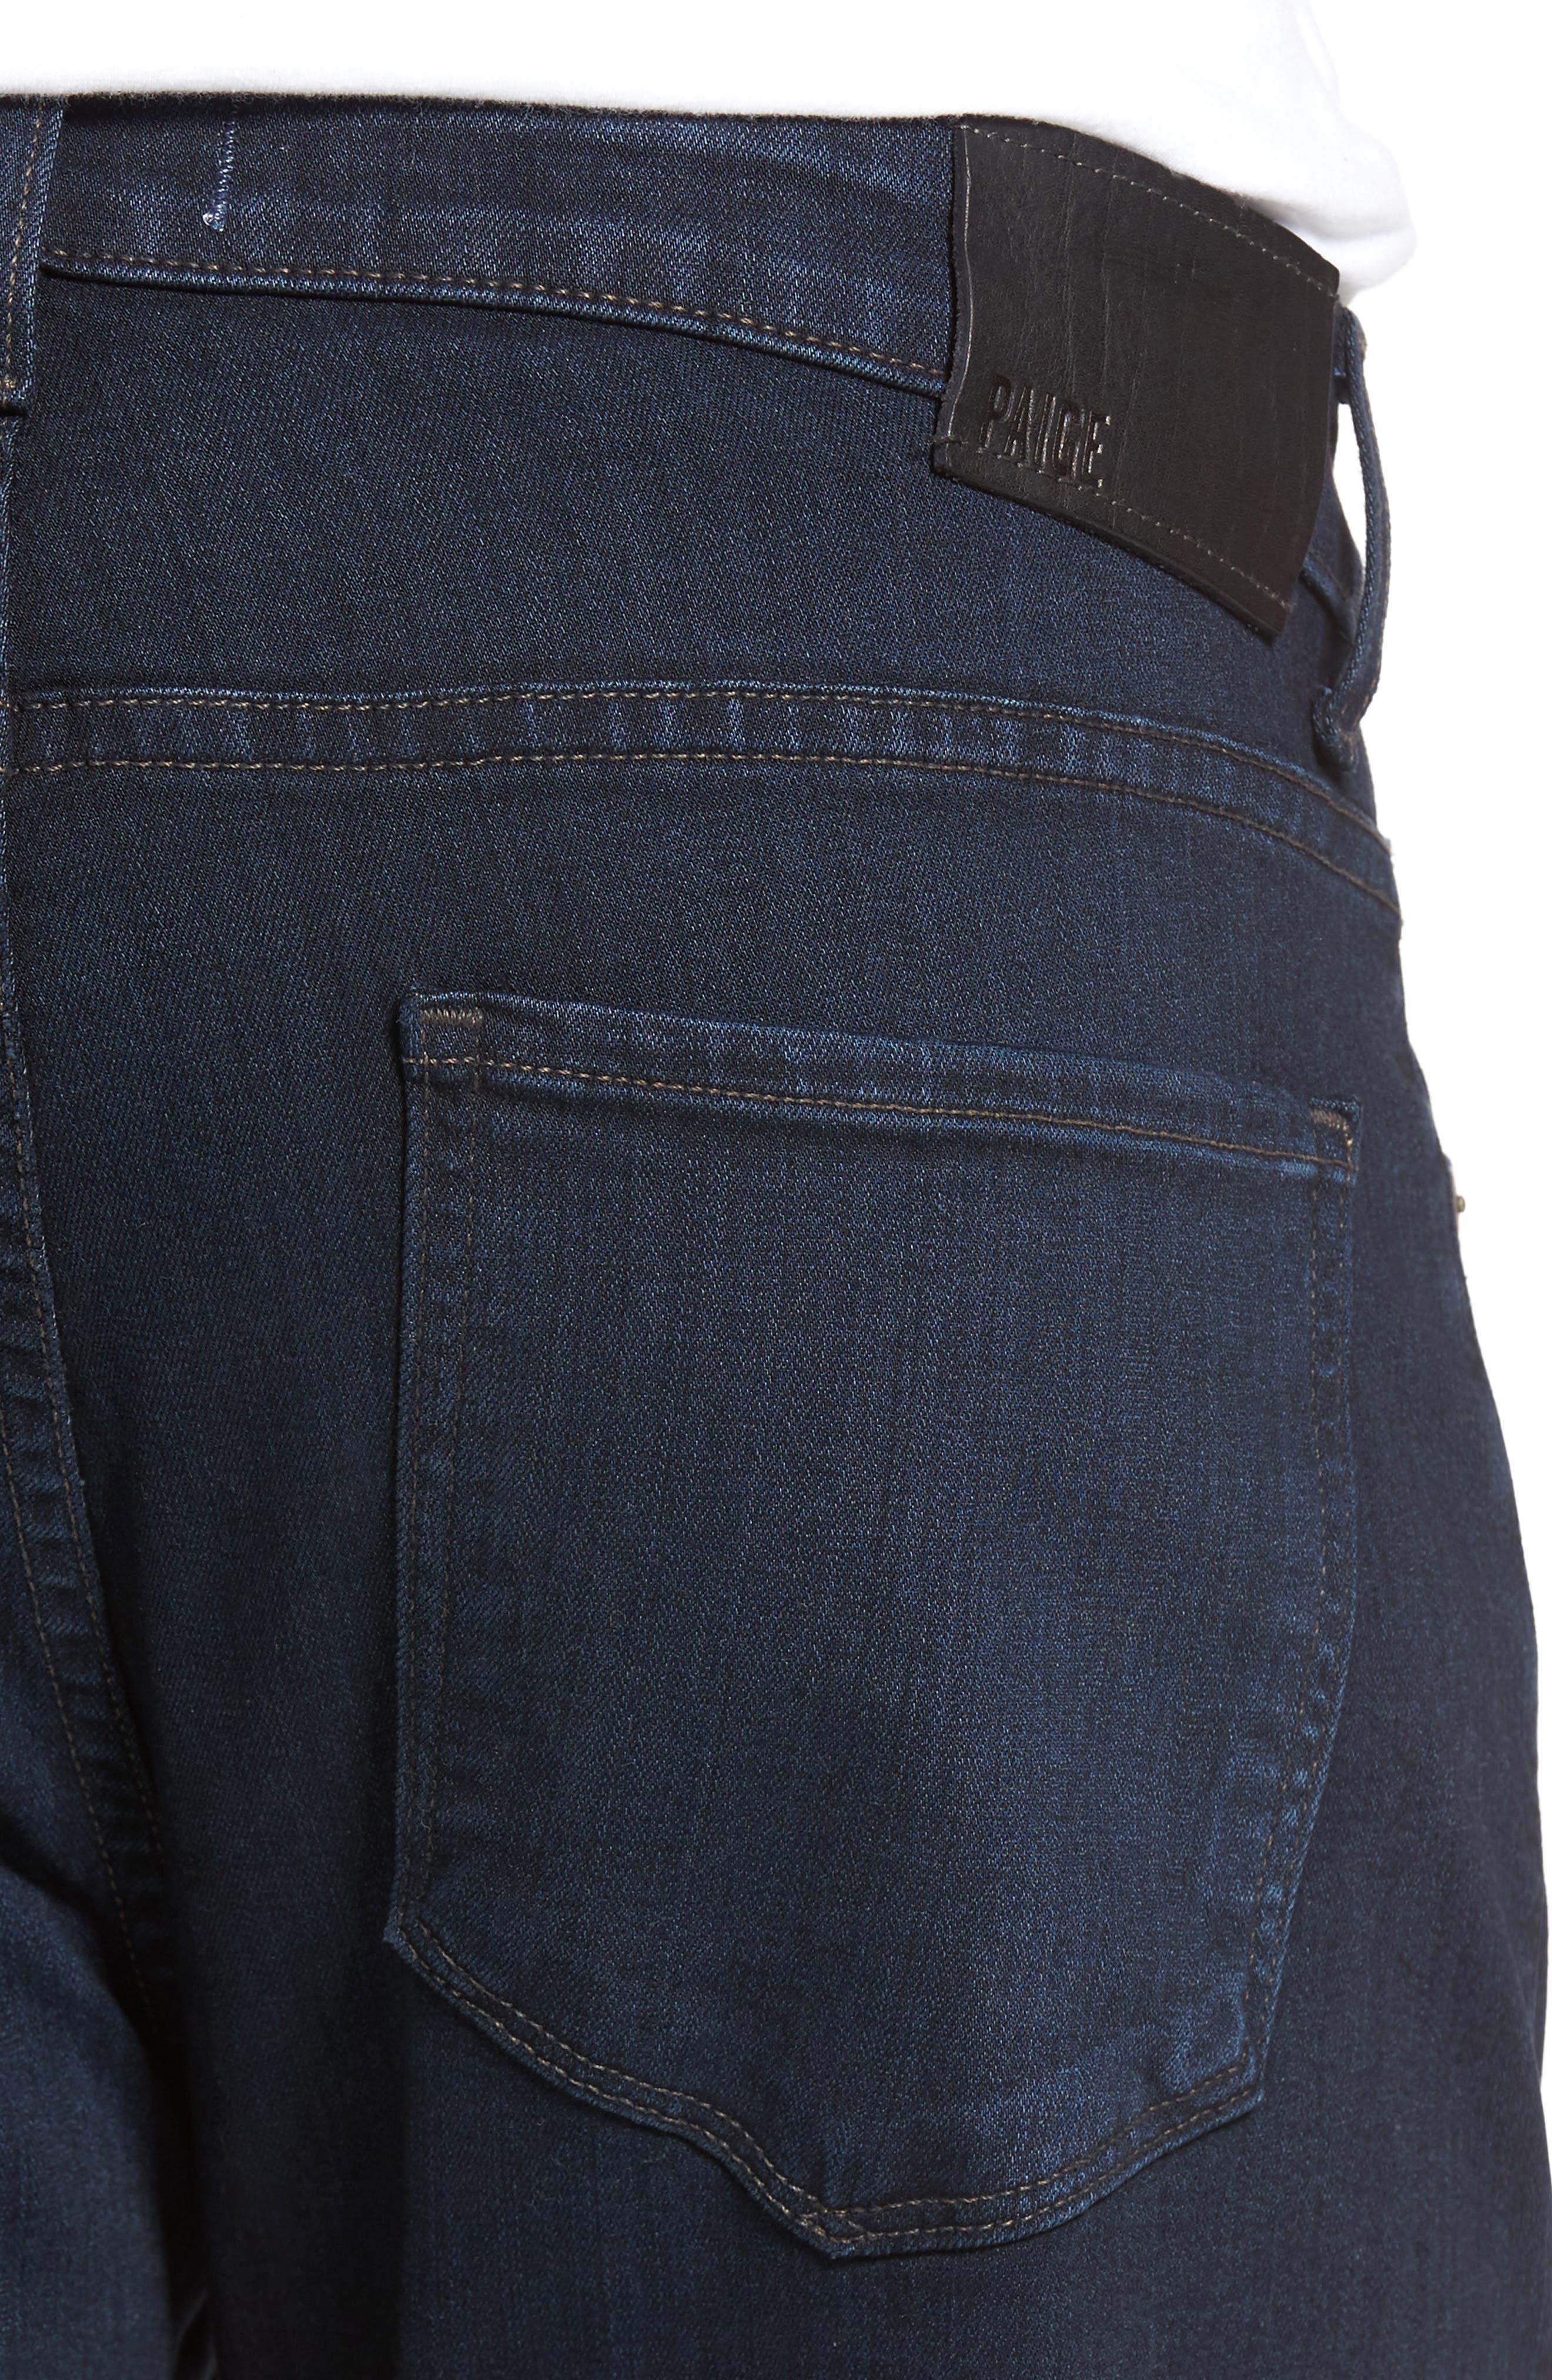 Normandie Straight Leg Jeans,                             Alternate thumbnail 4, color,                             ARLO